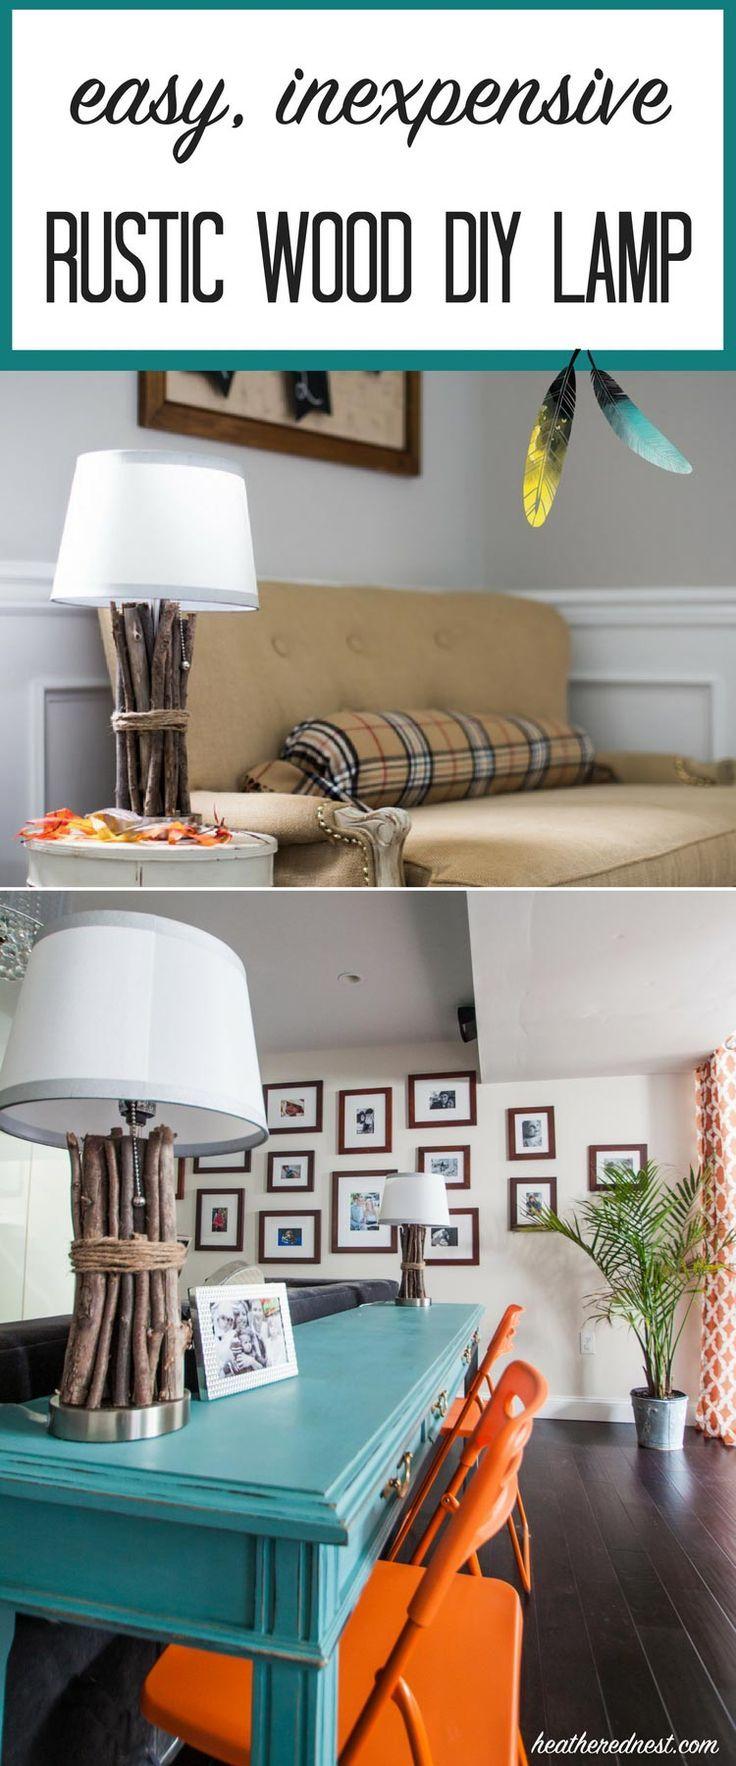 easy-diy-lamp-with-twigs-sticks-driftwood-desk-light-1